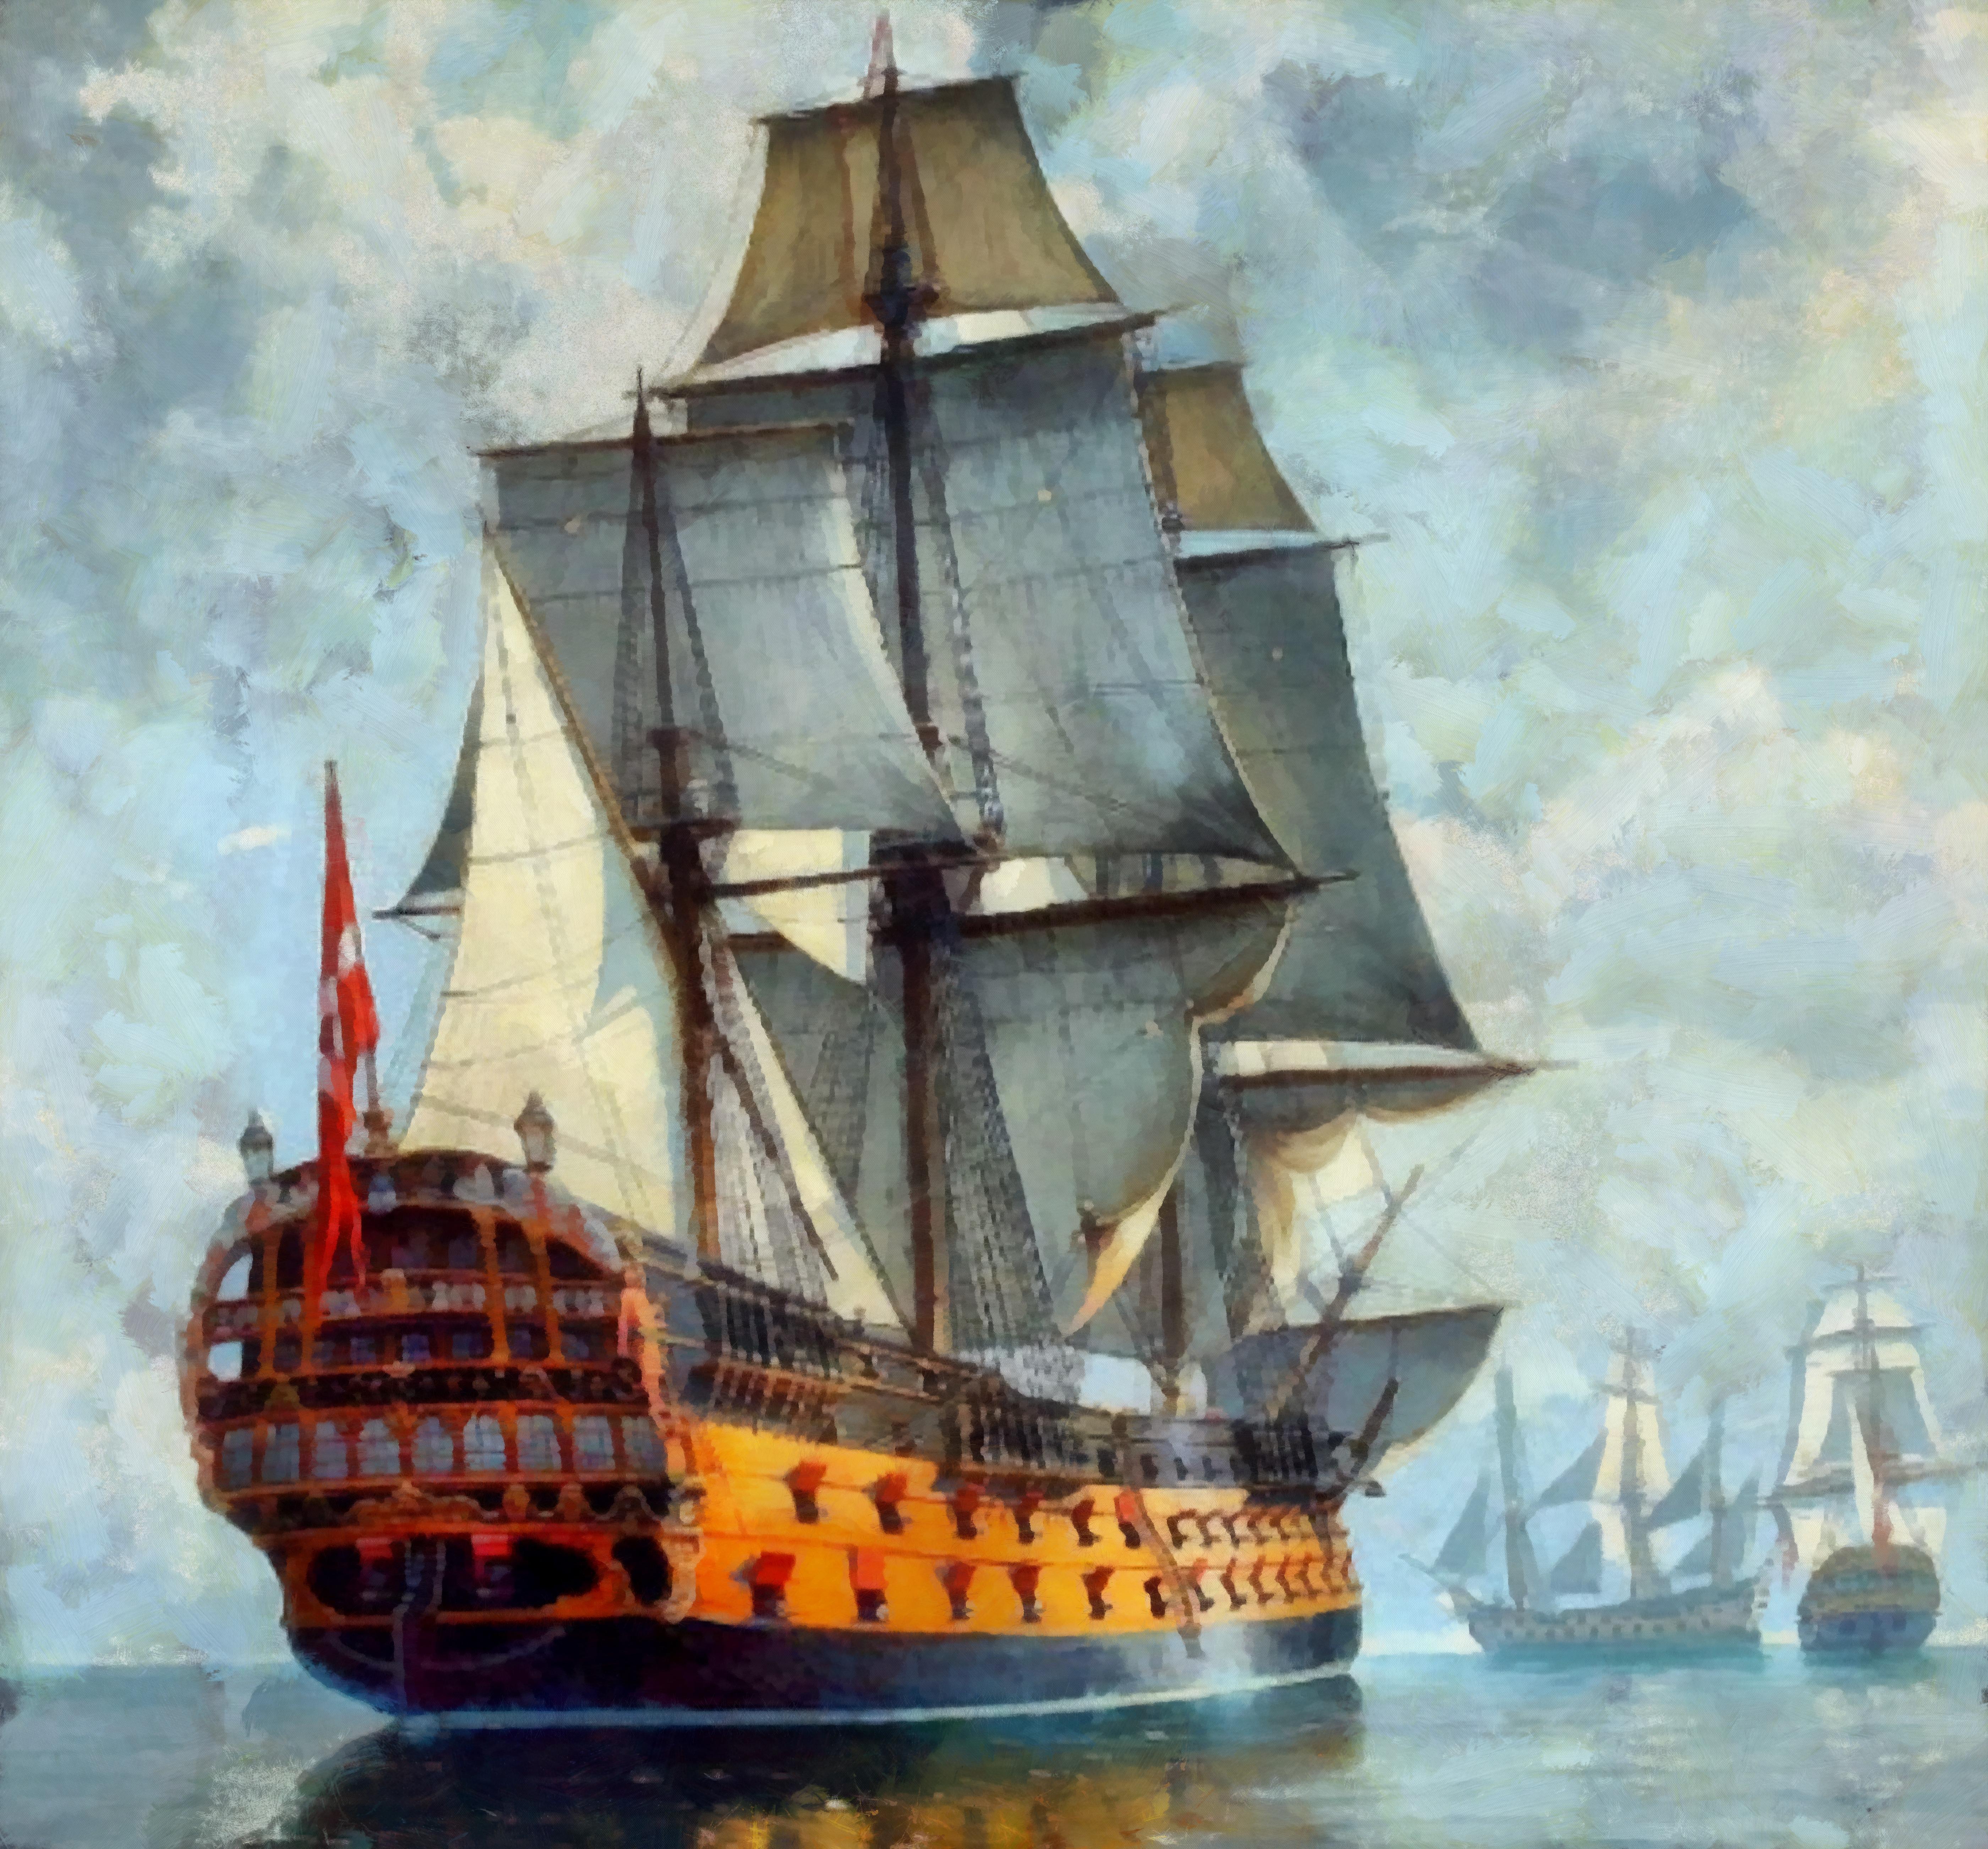 Christian VII (1767, Dano-Norwegian 90-gun ship)